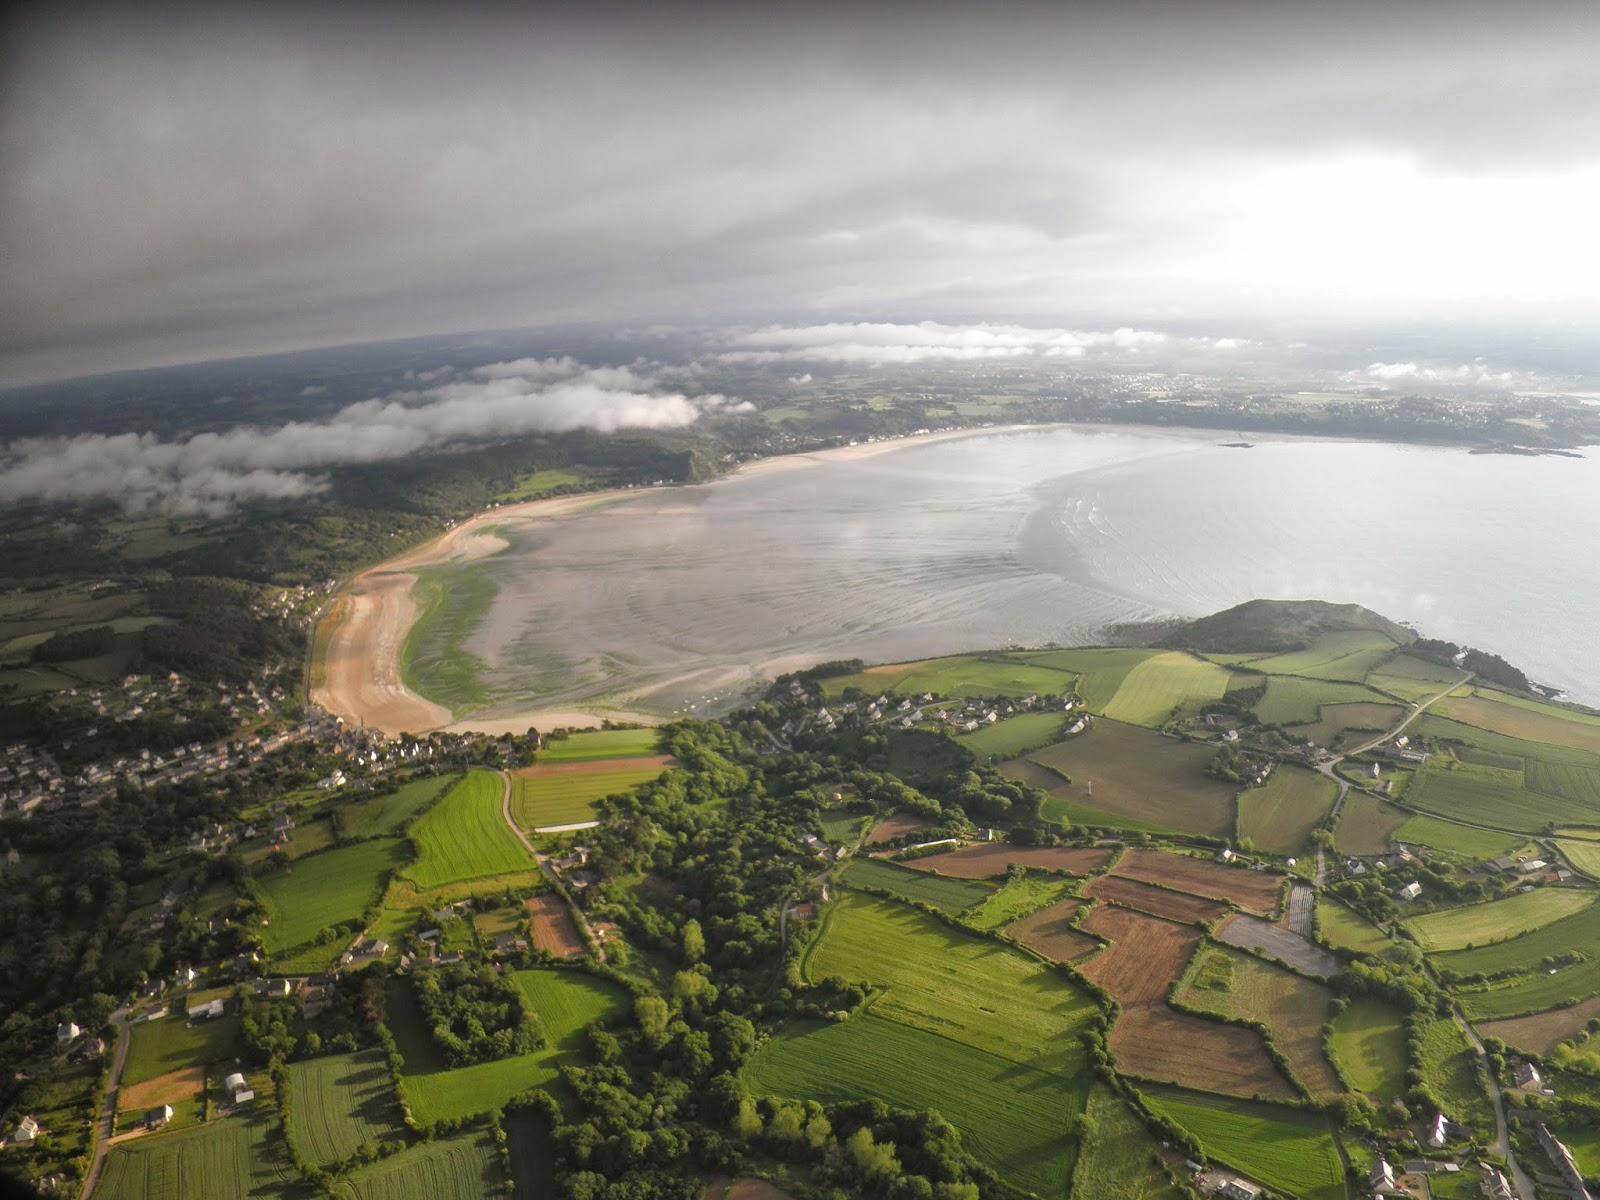 ULM Lannion | Baie de St-Efflam